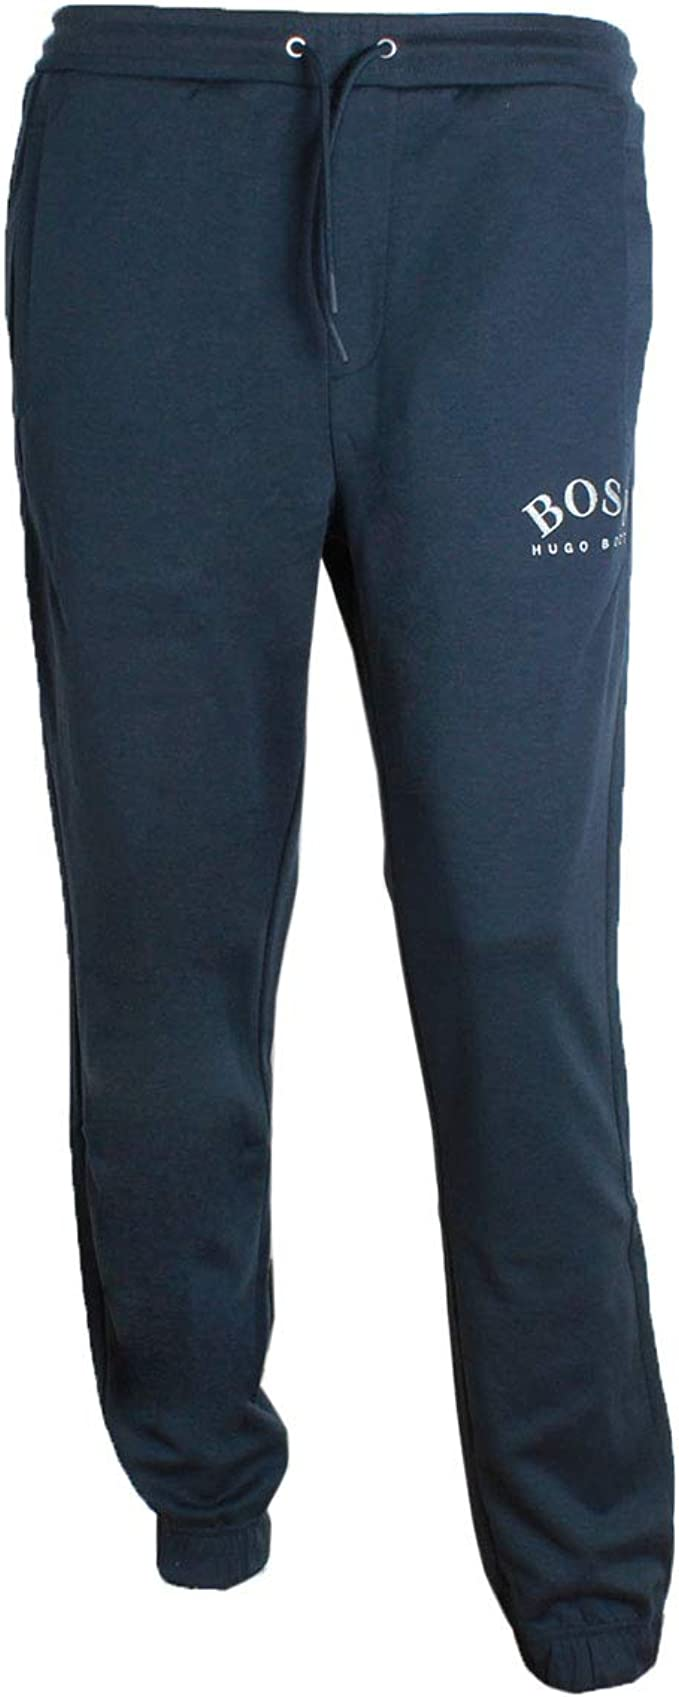 Mens Slim Fit Joggers Navy Tracksuit Bottoms Frontside Sportswear